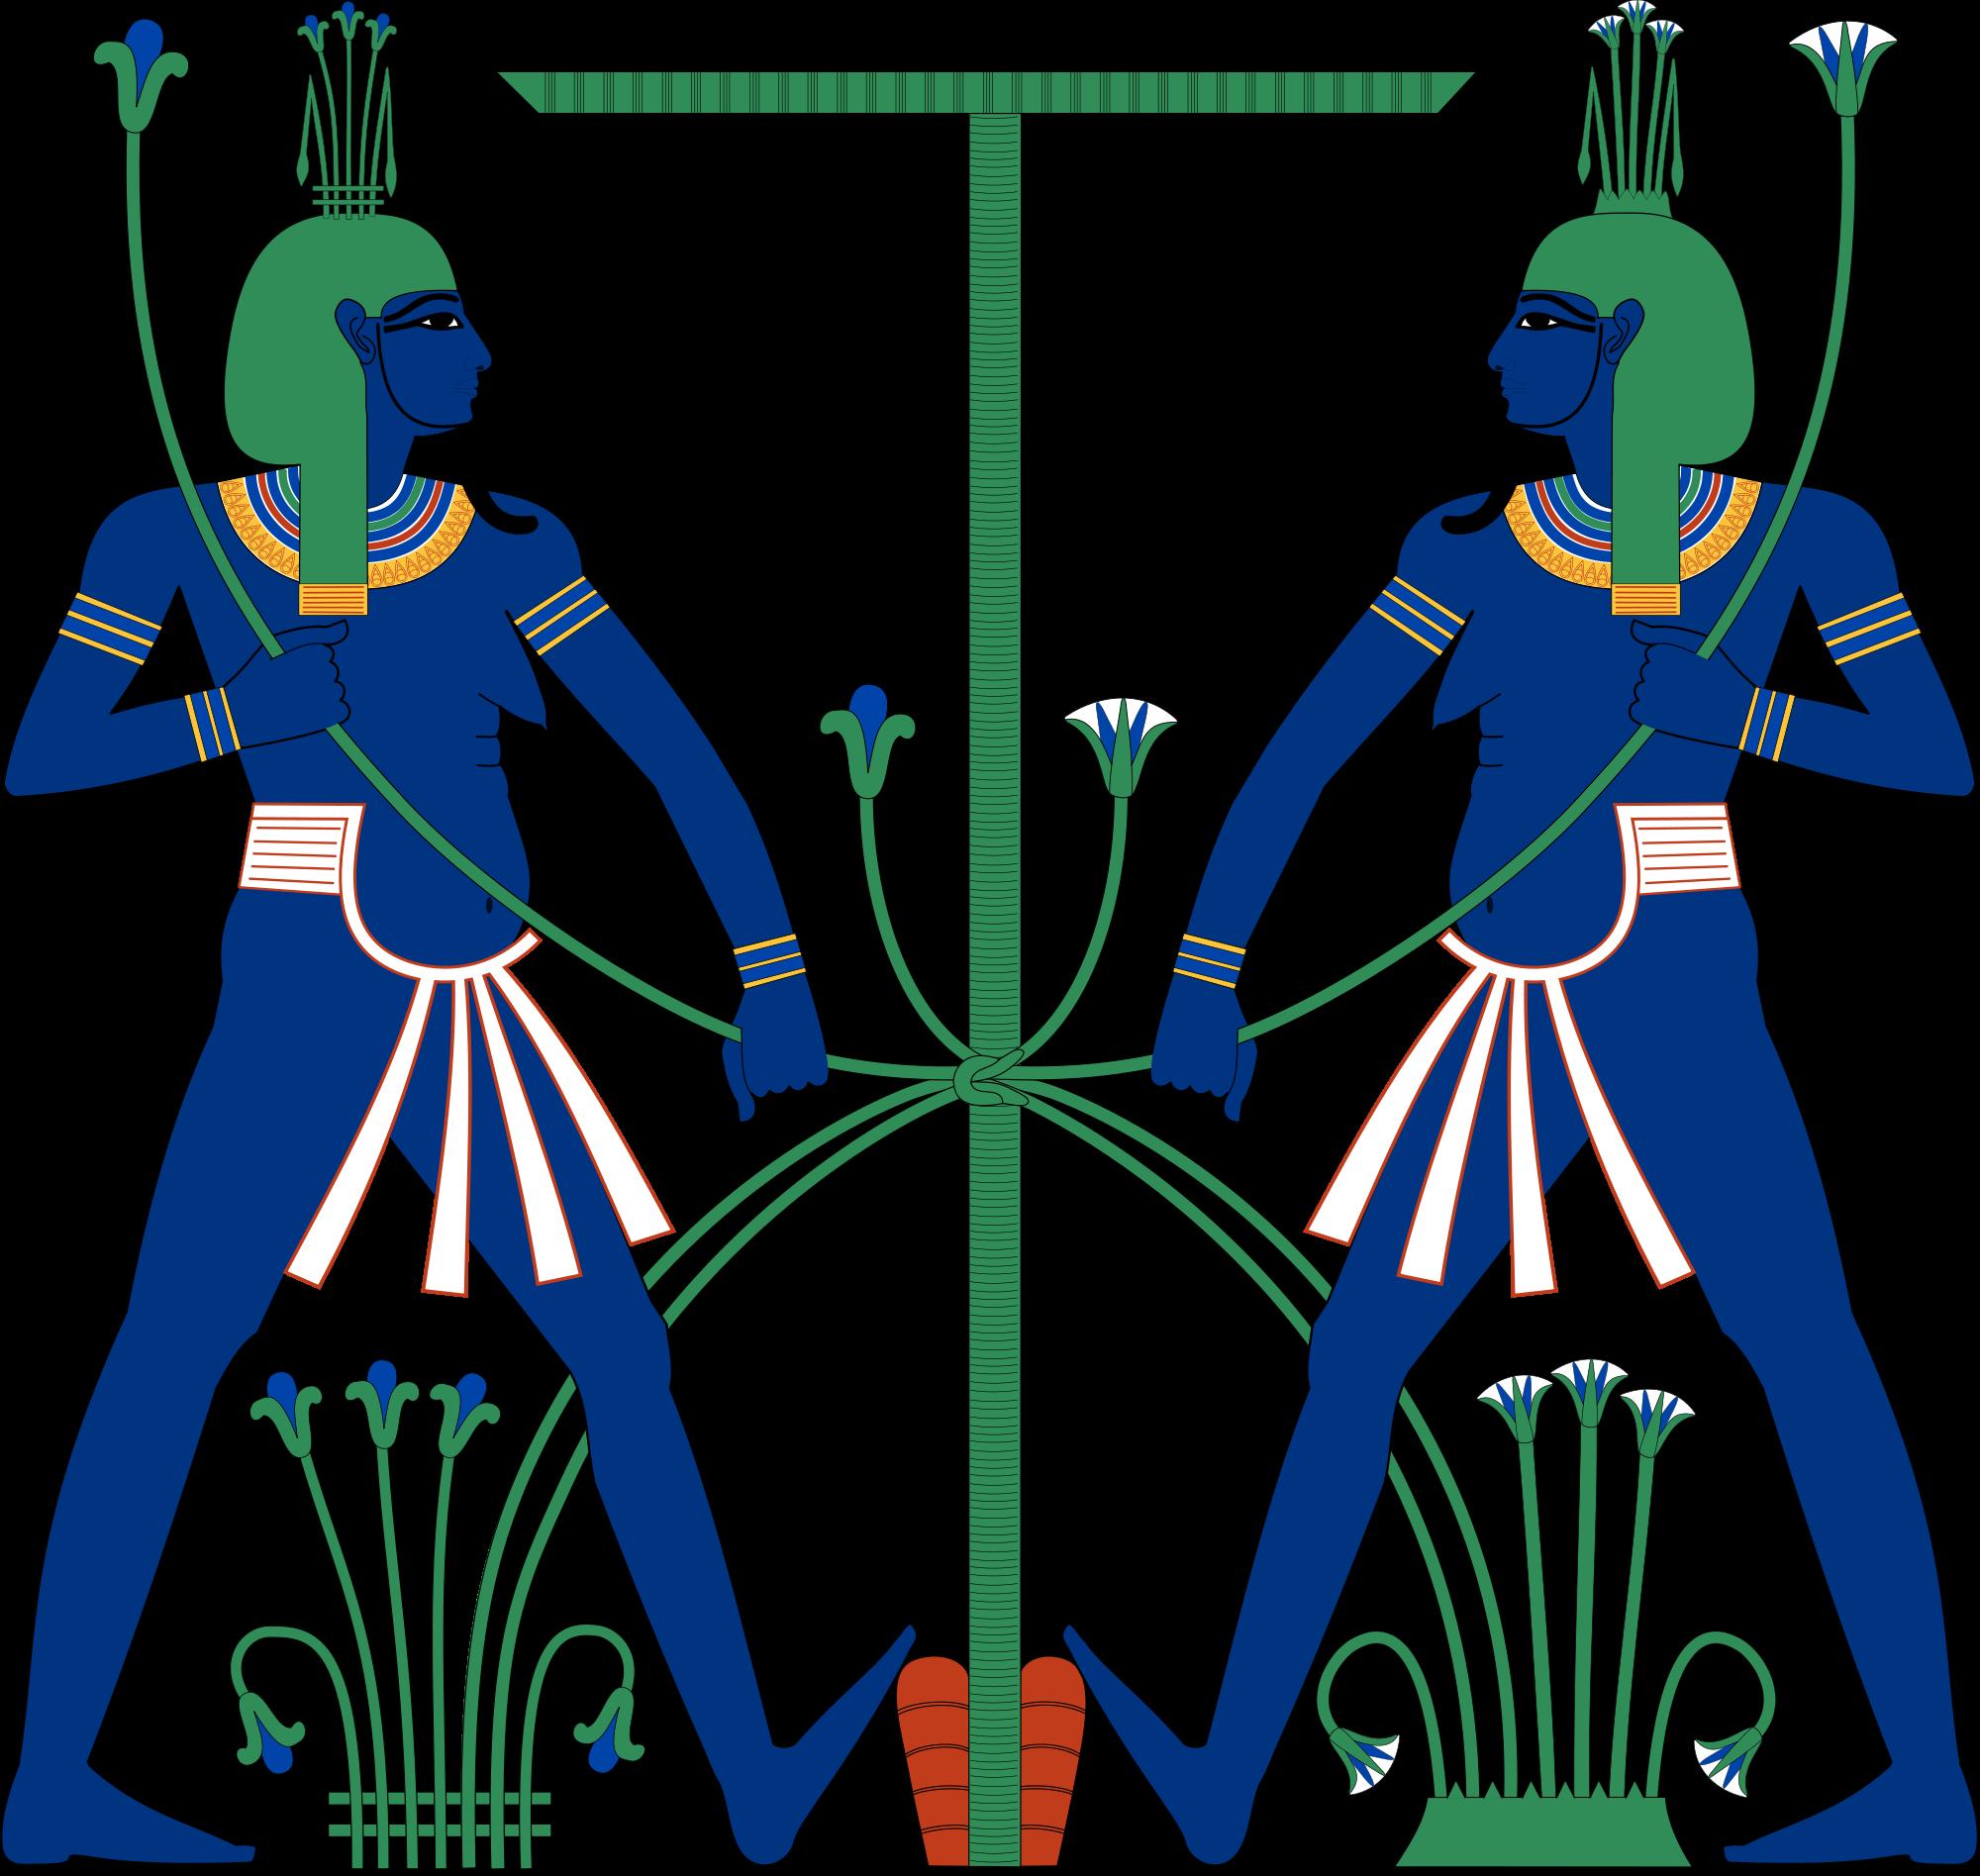 Nile religions and deities. History clipart history egypt